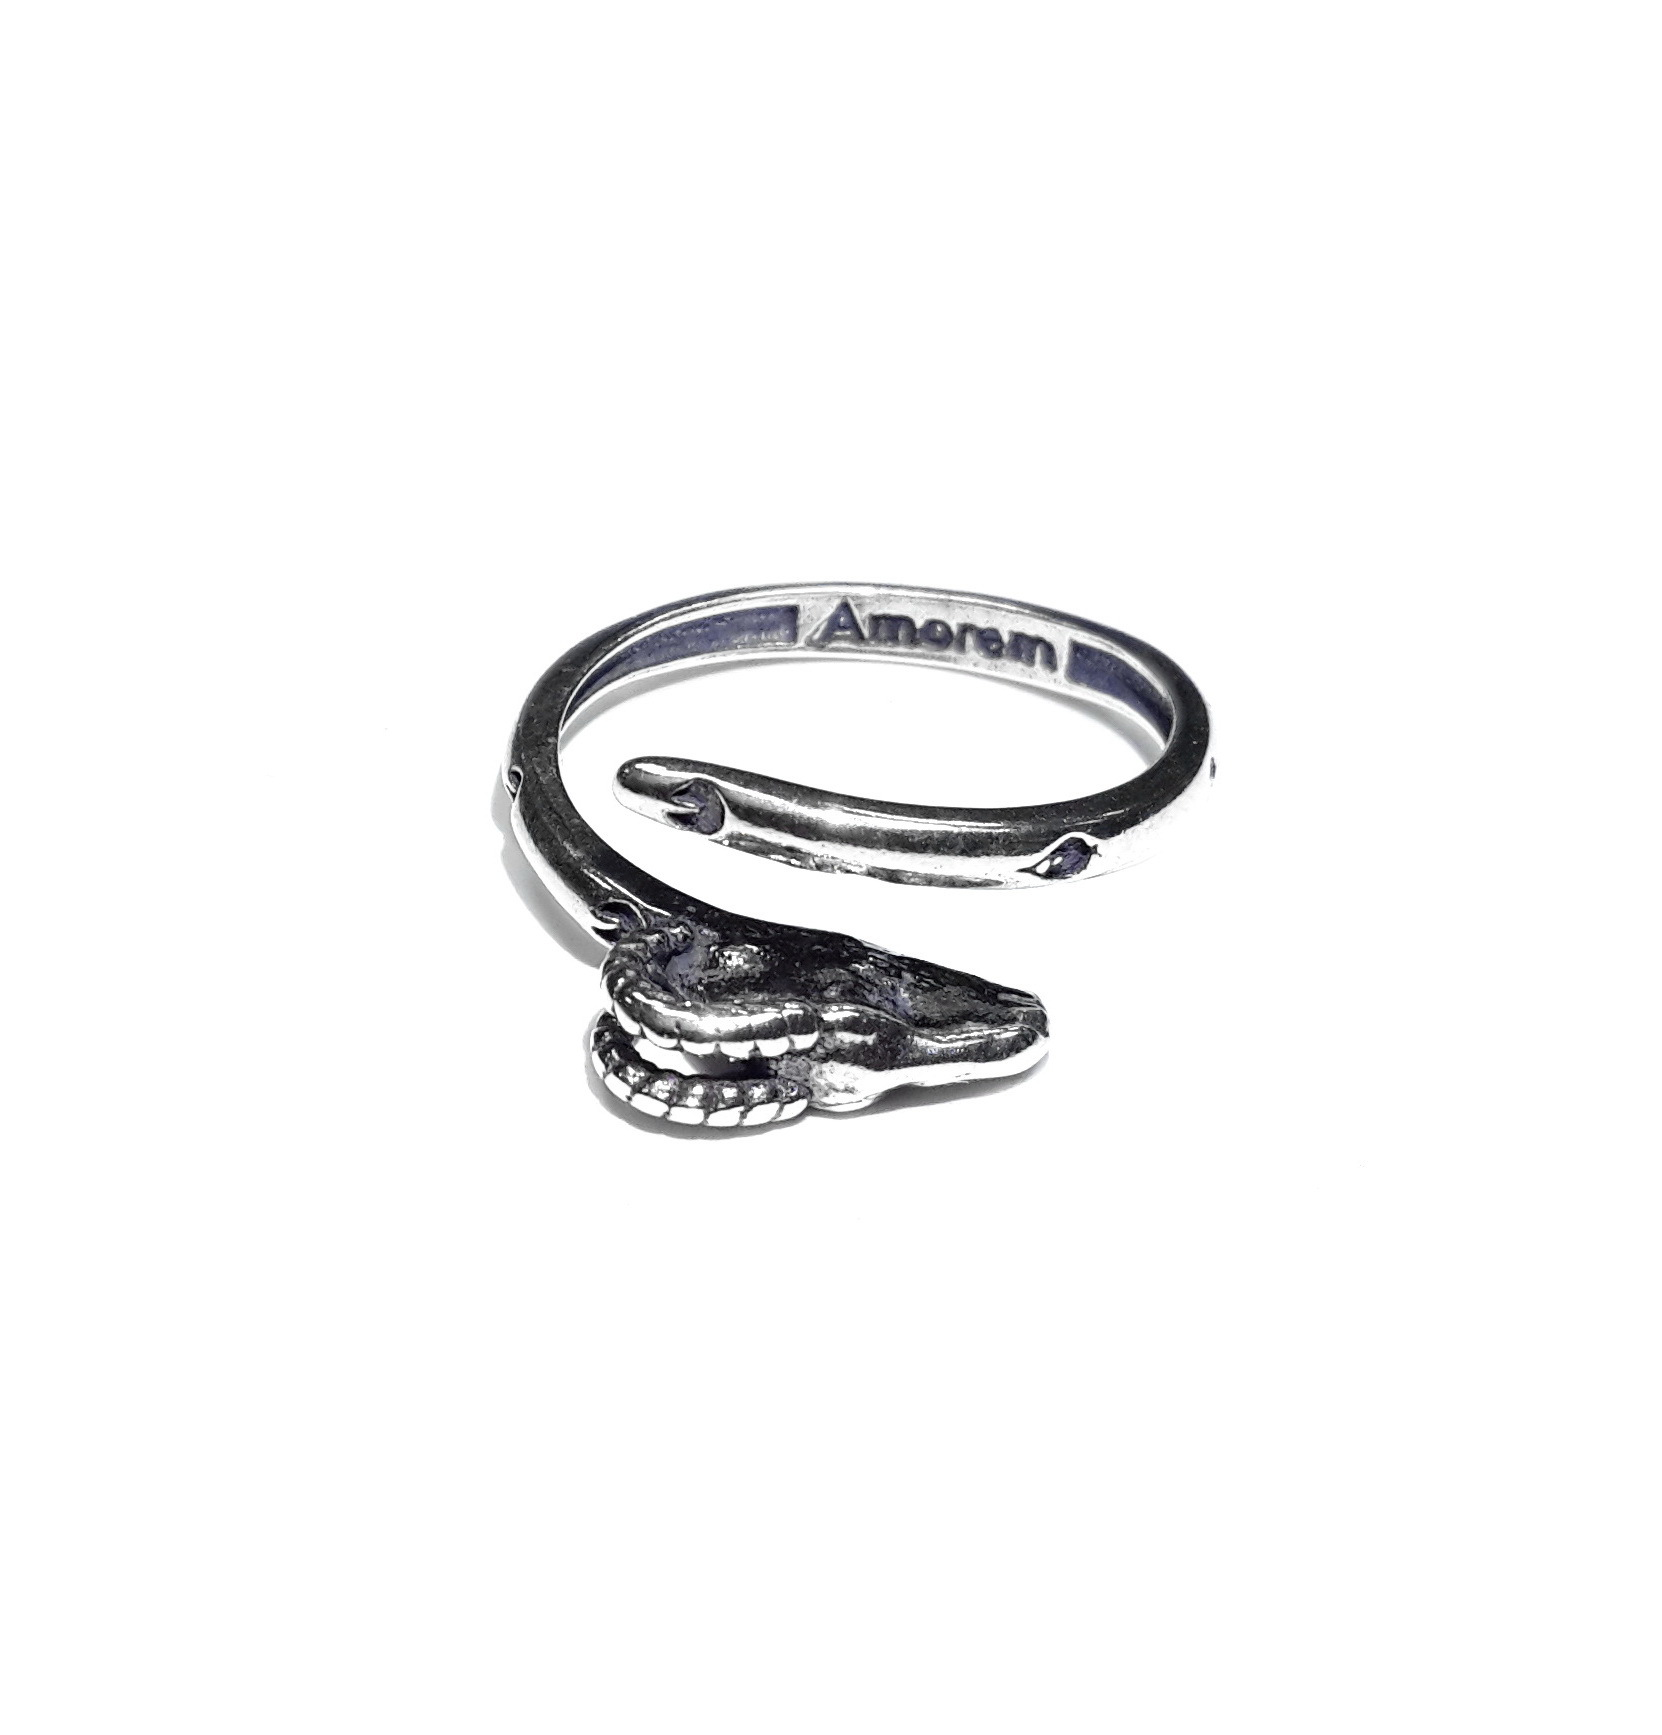 Ram Totem Ring, Sterling Silver